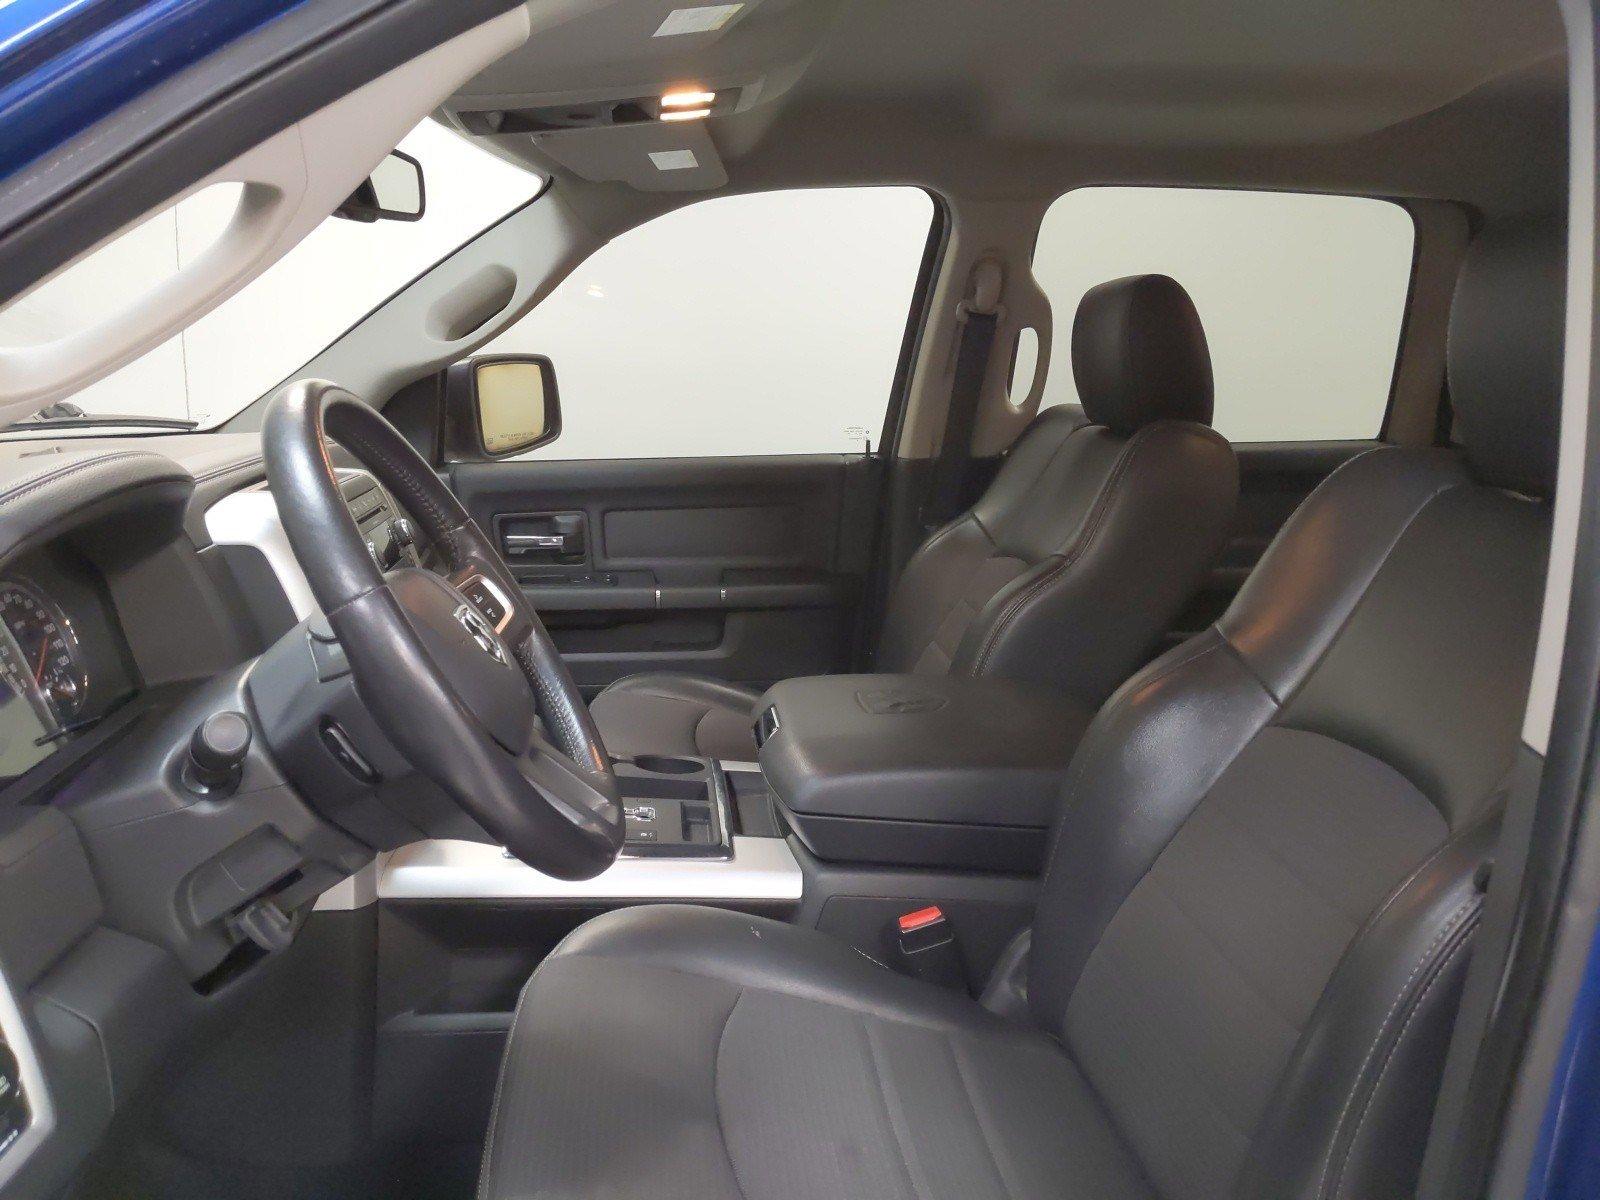 Used 2010 Dodge Ram 1500 Sport Crew Cab Pickup for sale in Grand Island NE